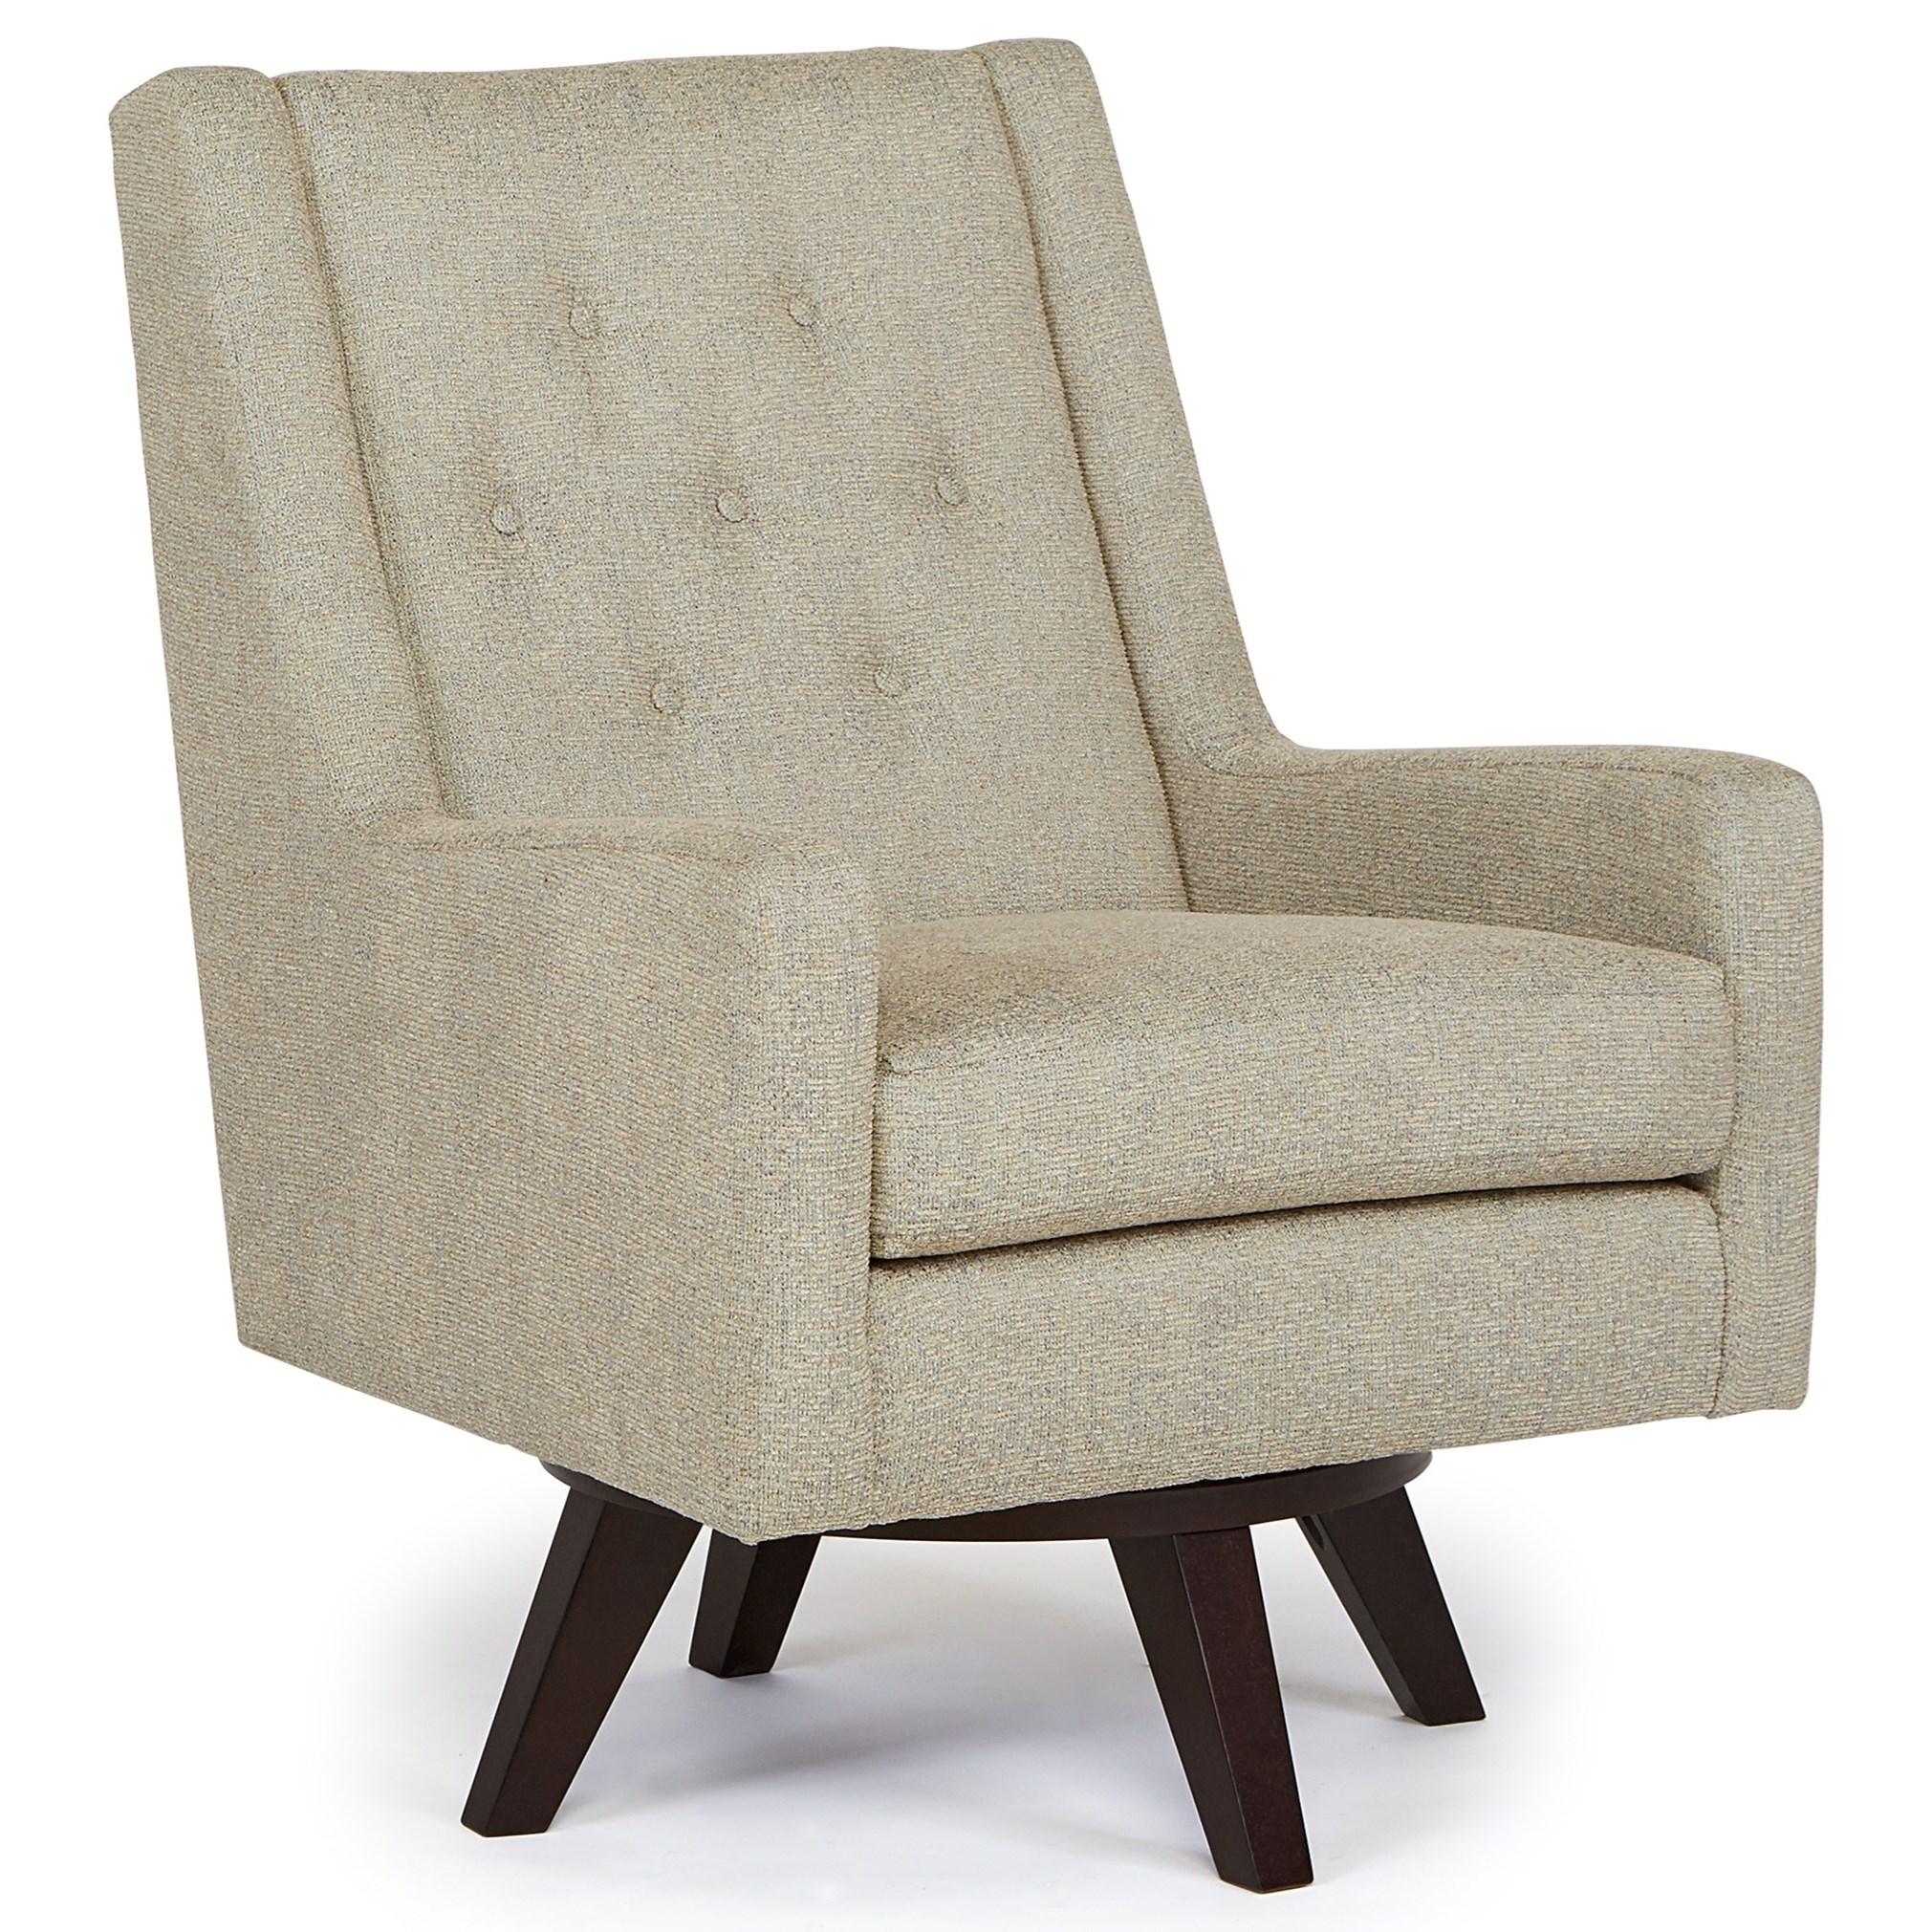 Best Home Furnishings Chairs   Swivel Barrel Kale Swivel Chair